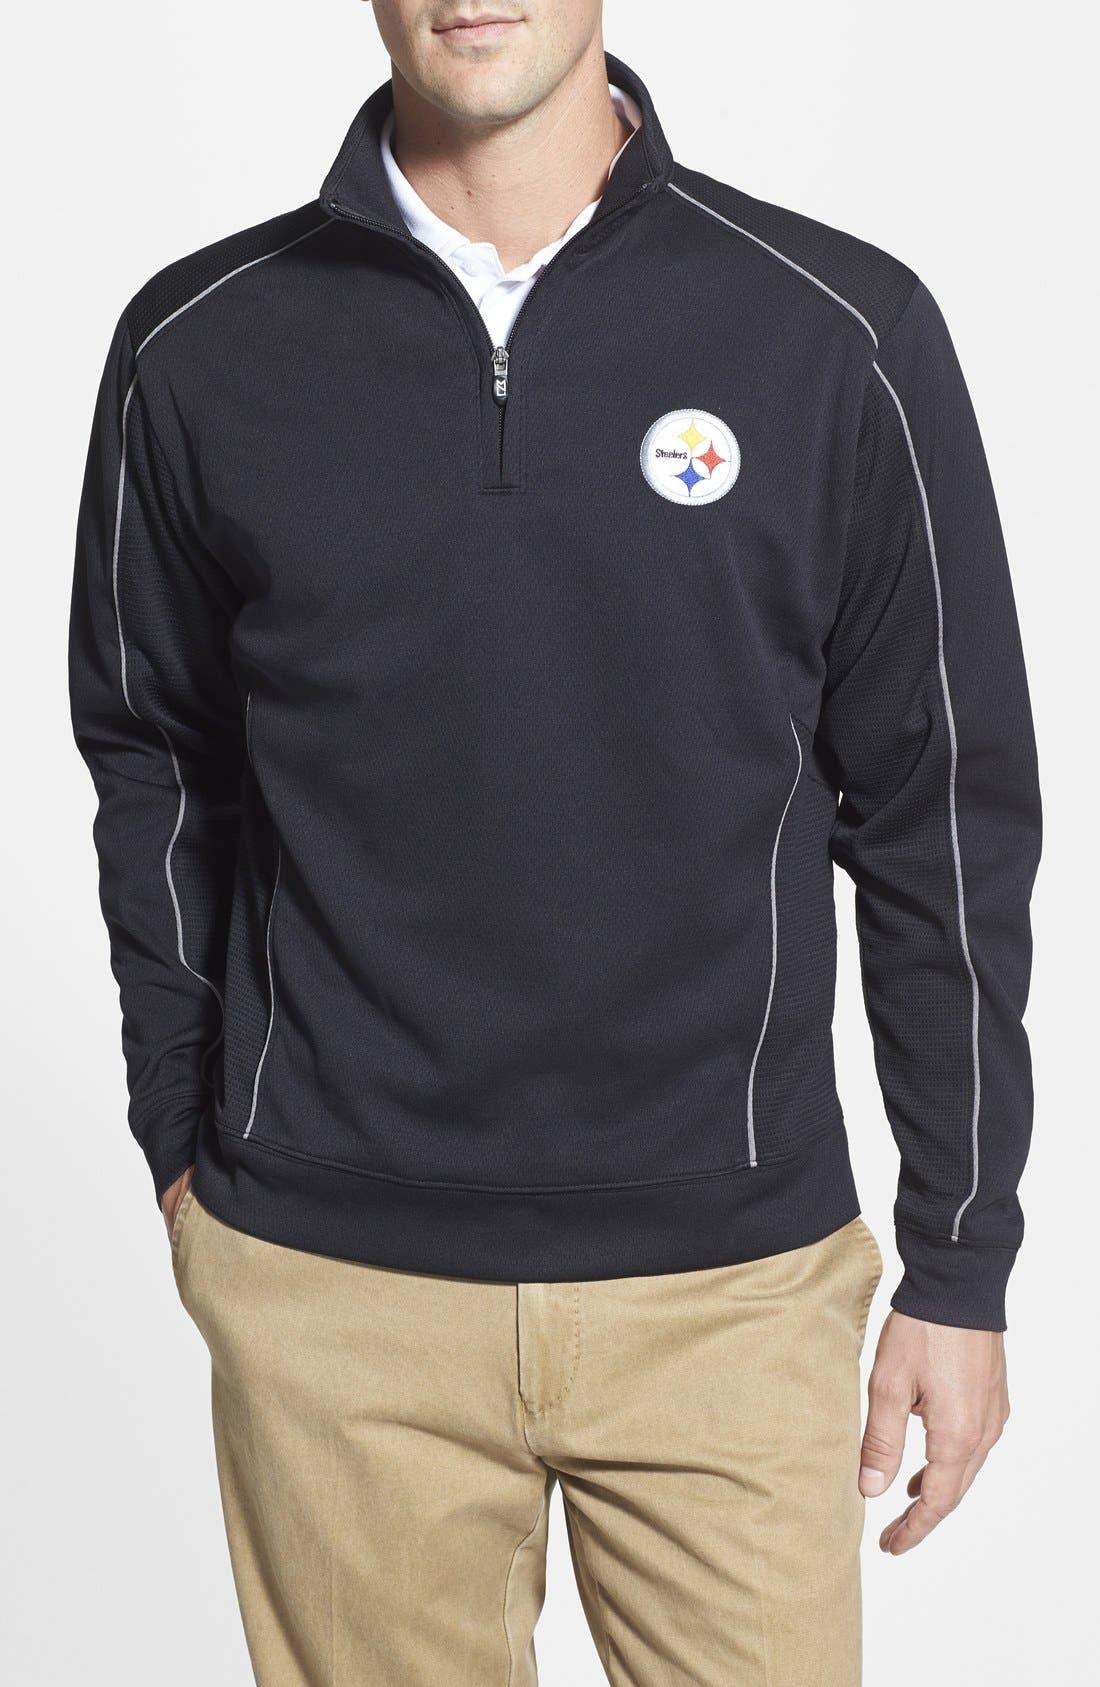 Pittsburgh Steelers - Edge DryTec Moisture Wicking Half Zip Pullover,                         Main,                         color, 001